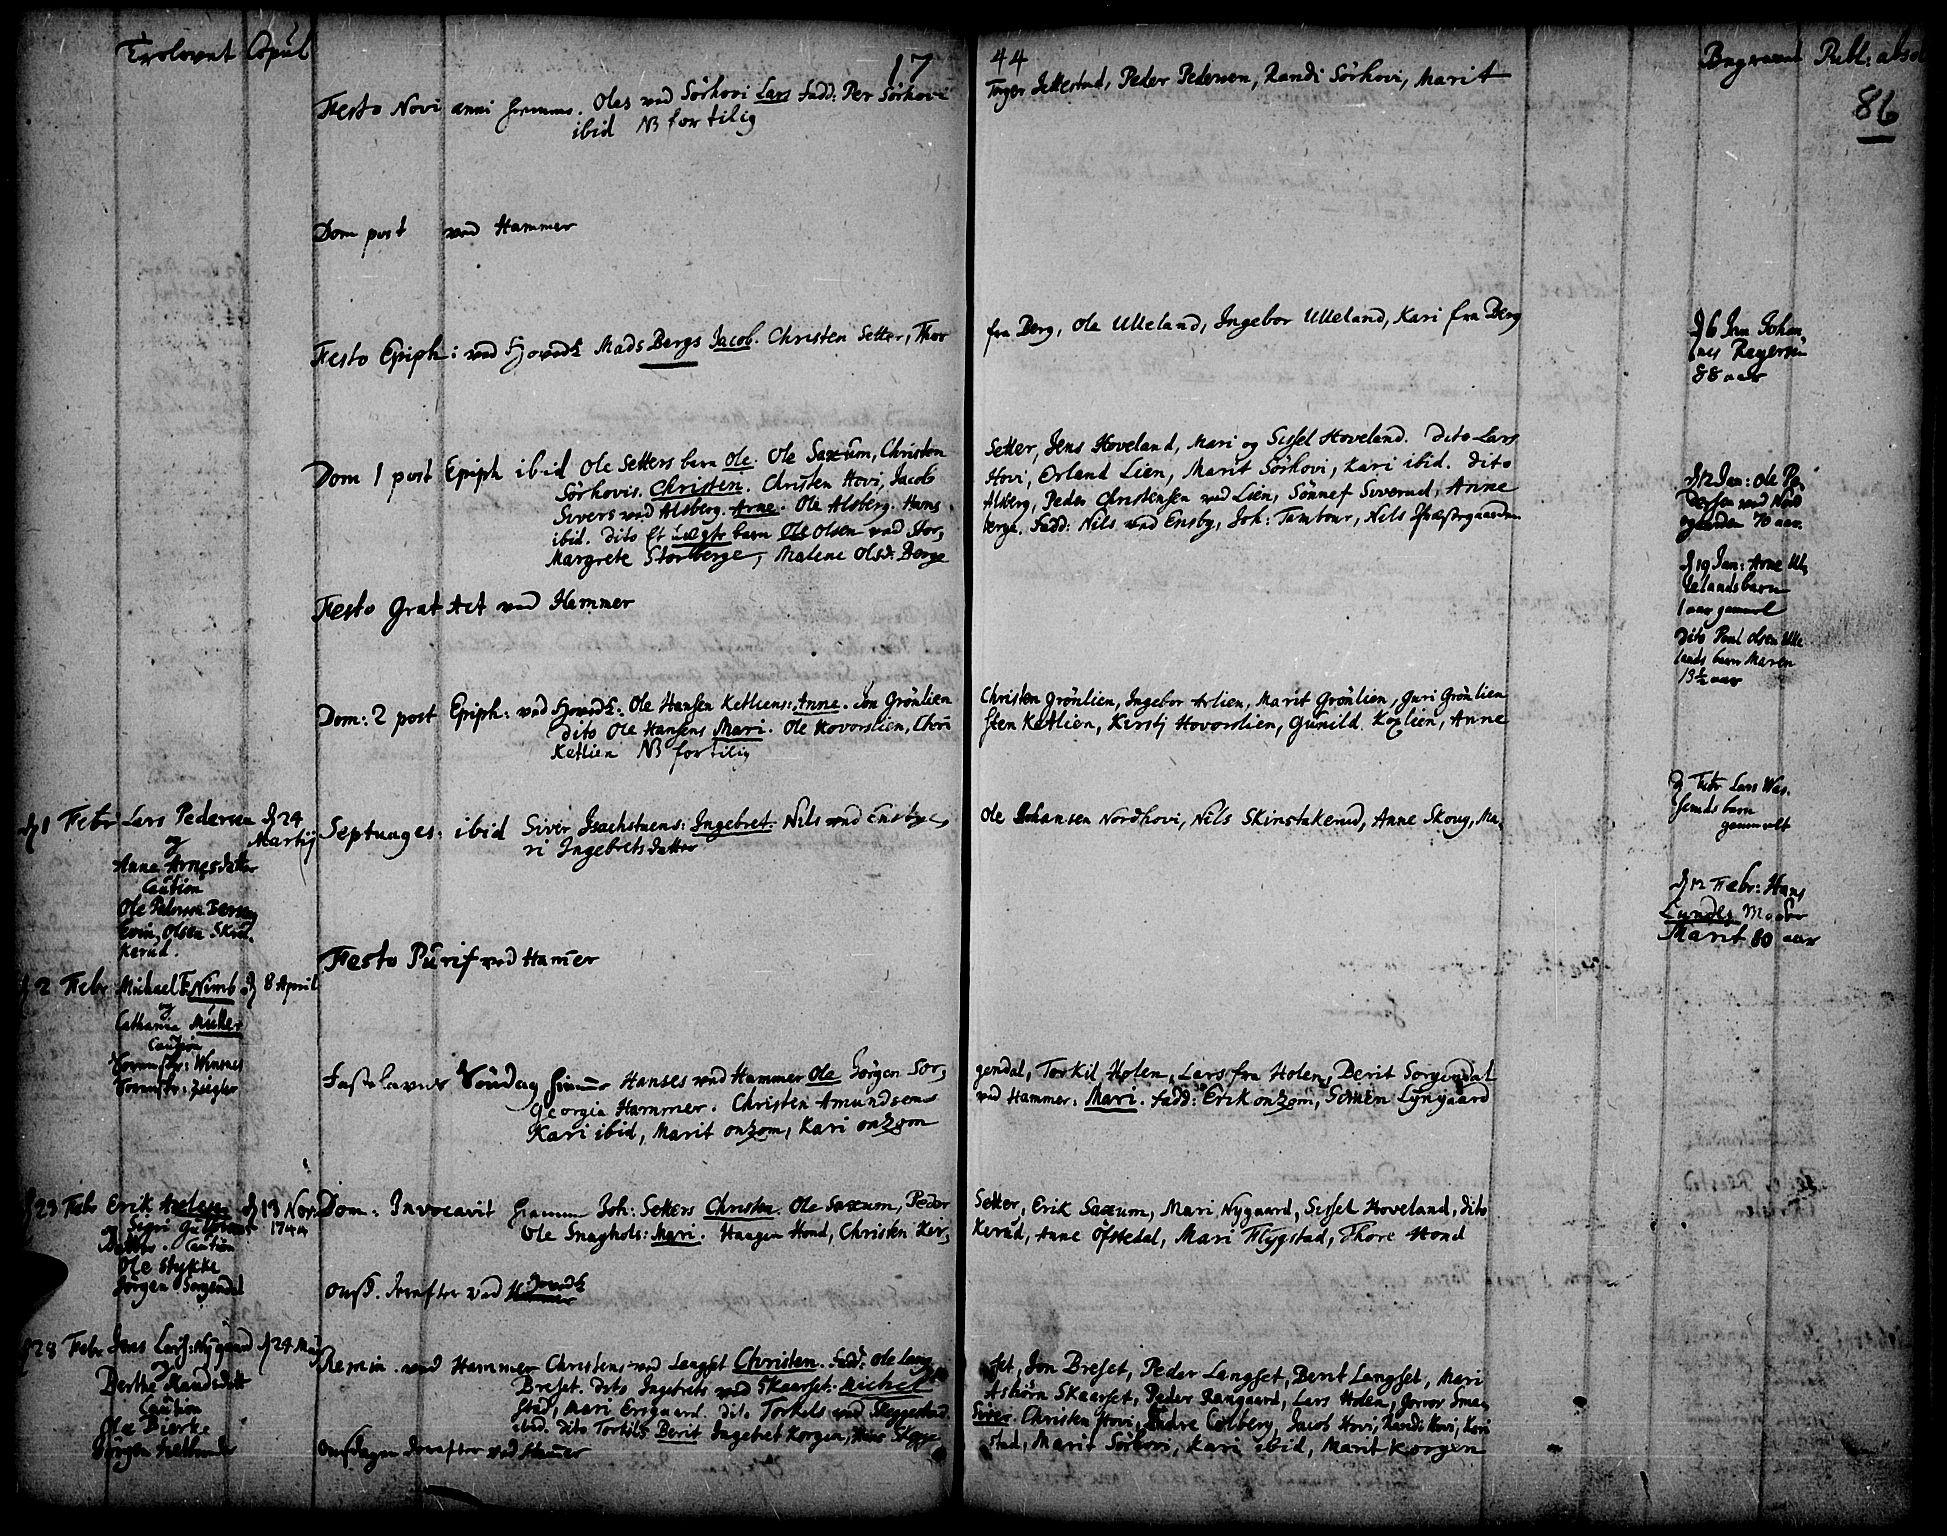 SAH, Fåberg prestekontor, Ministerialbok nr. 1, 1727-1775, s. 86